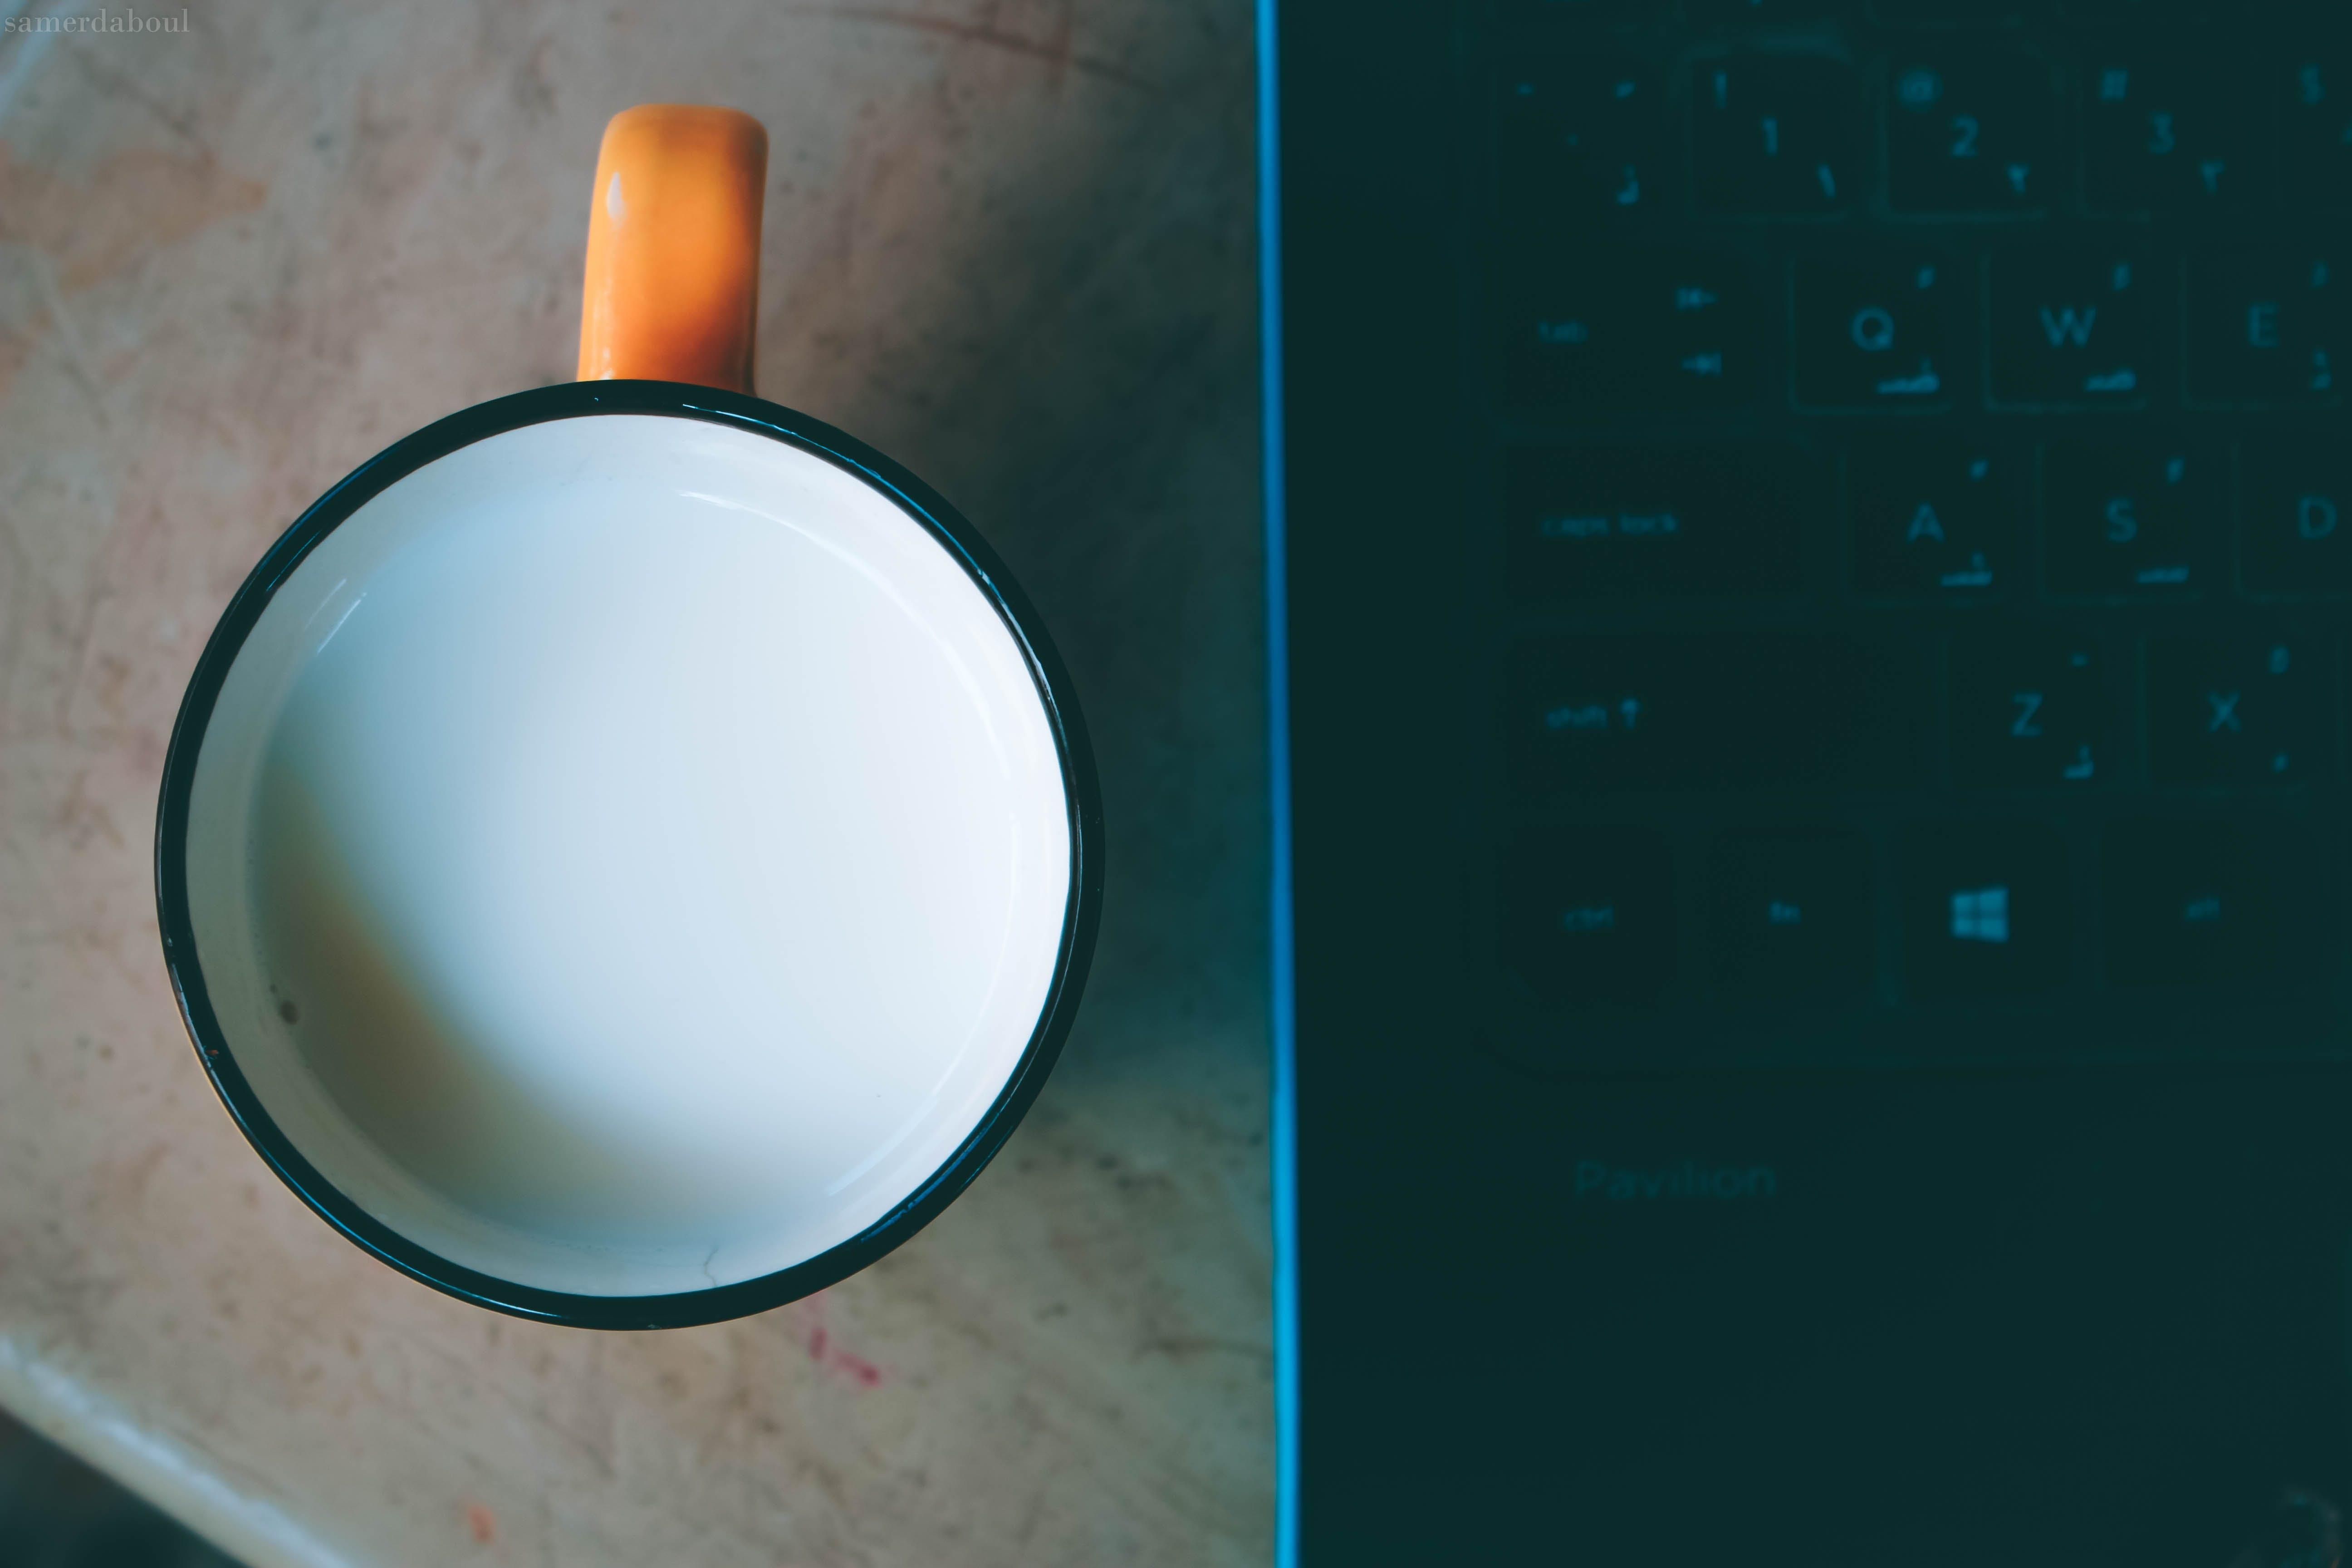 Orange and Black Ceramic Mug With Milk Beside Black Laptop